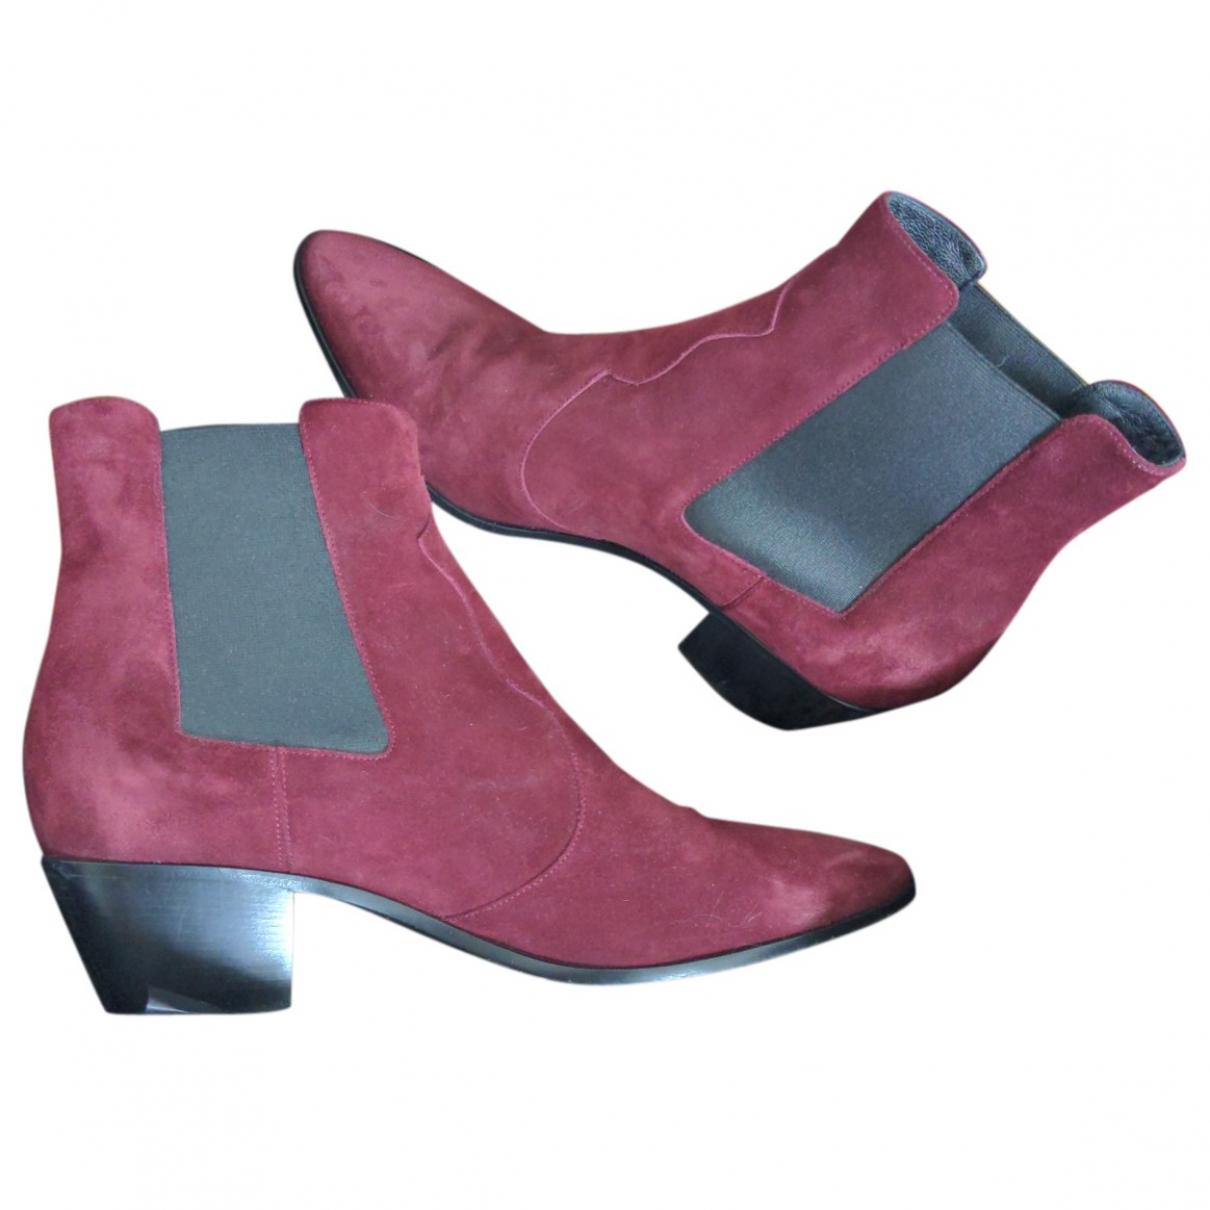 Saint Laurent \N Burgundy Suede Boots for Women 40 EU